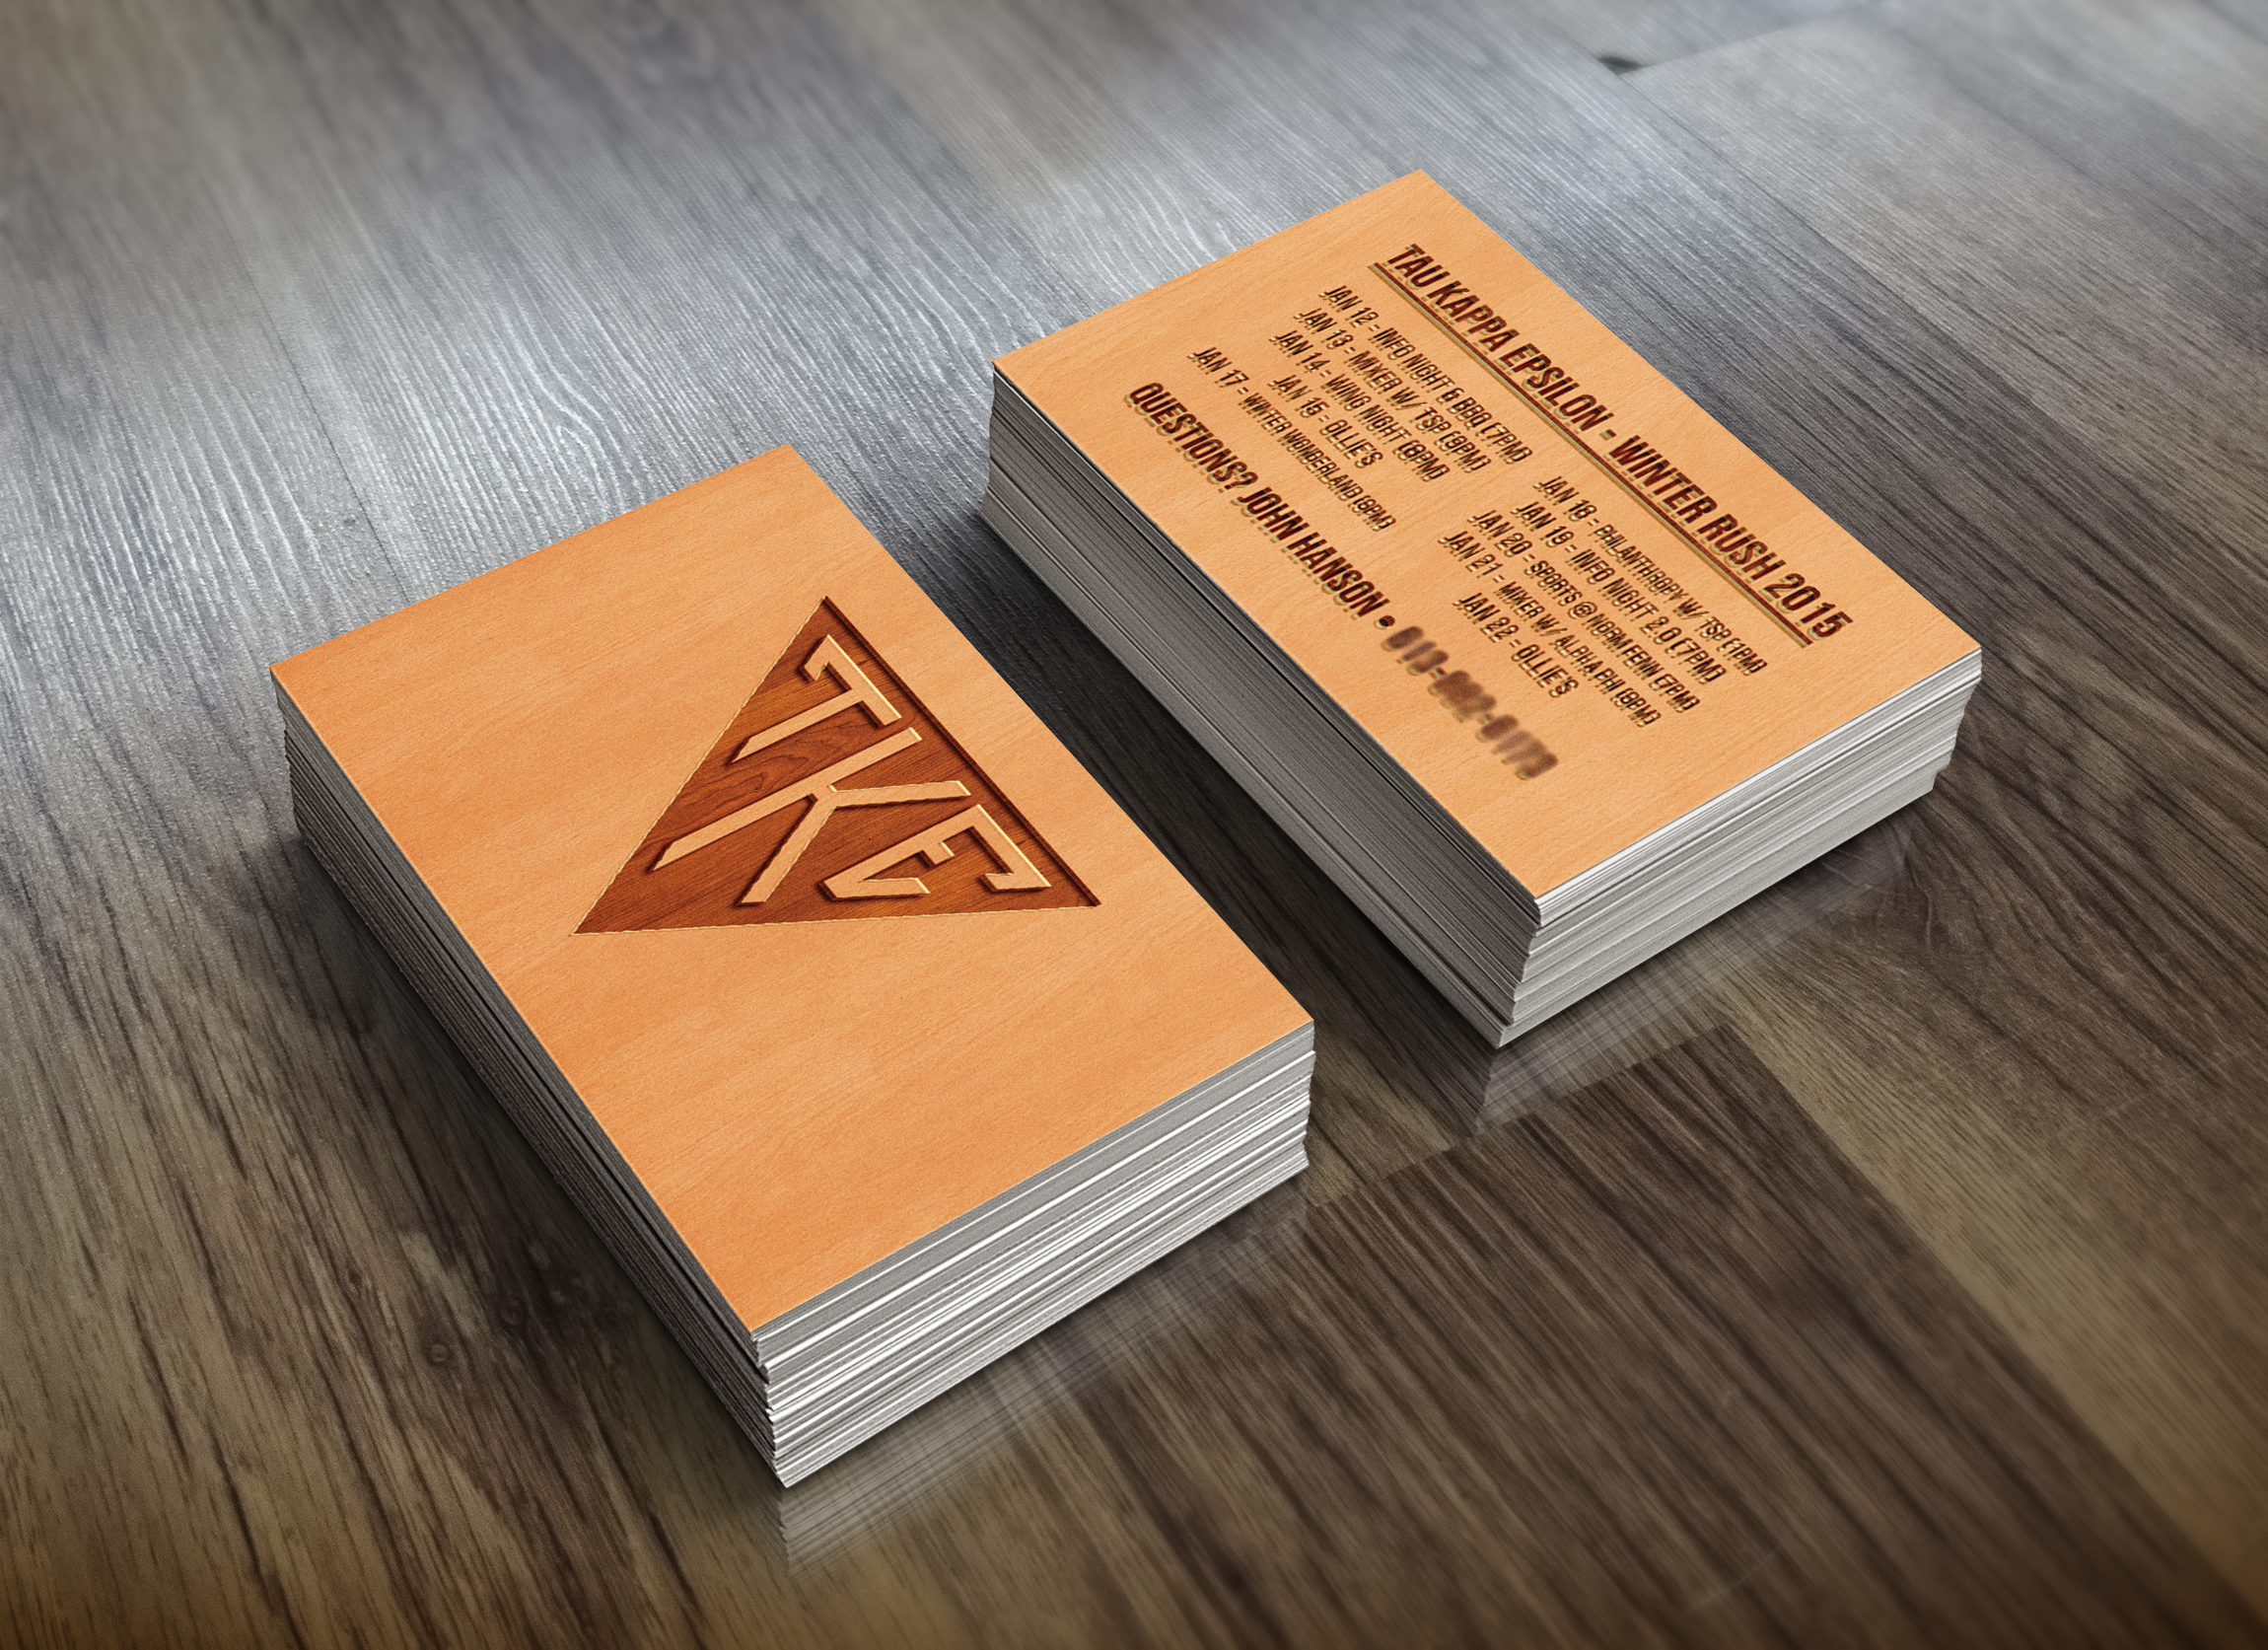 Tke rush card concept design by harrison boyd chil print tke rush card concept design by harrison boyd colourmoves